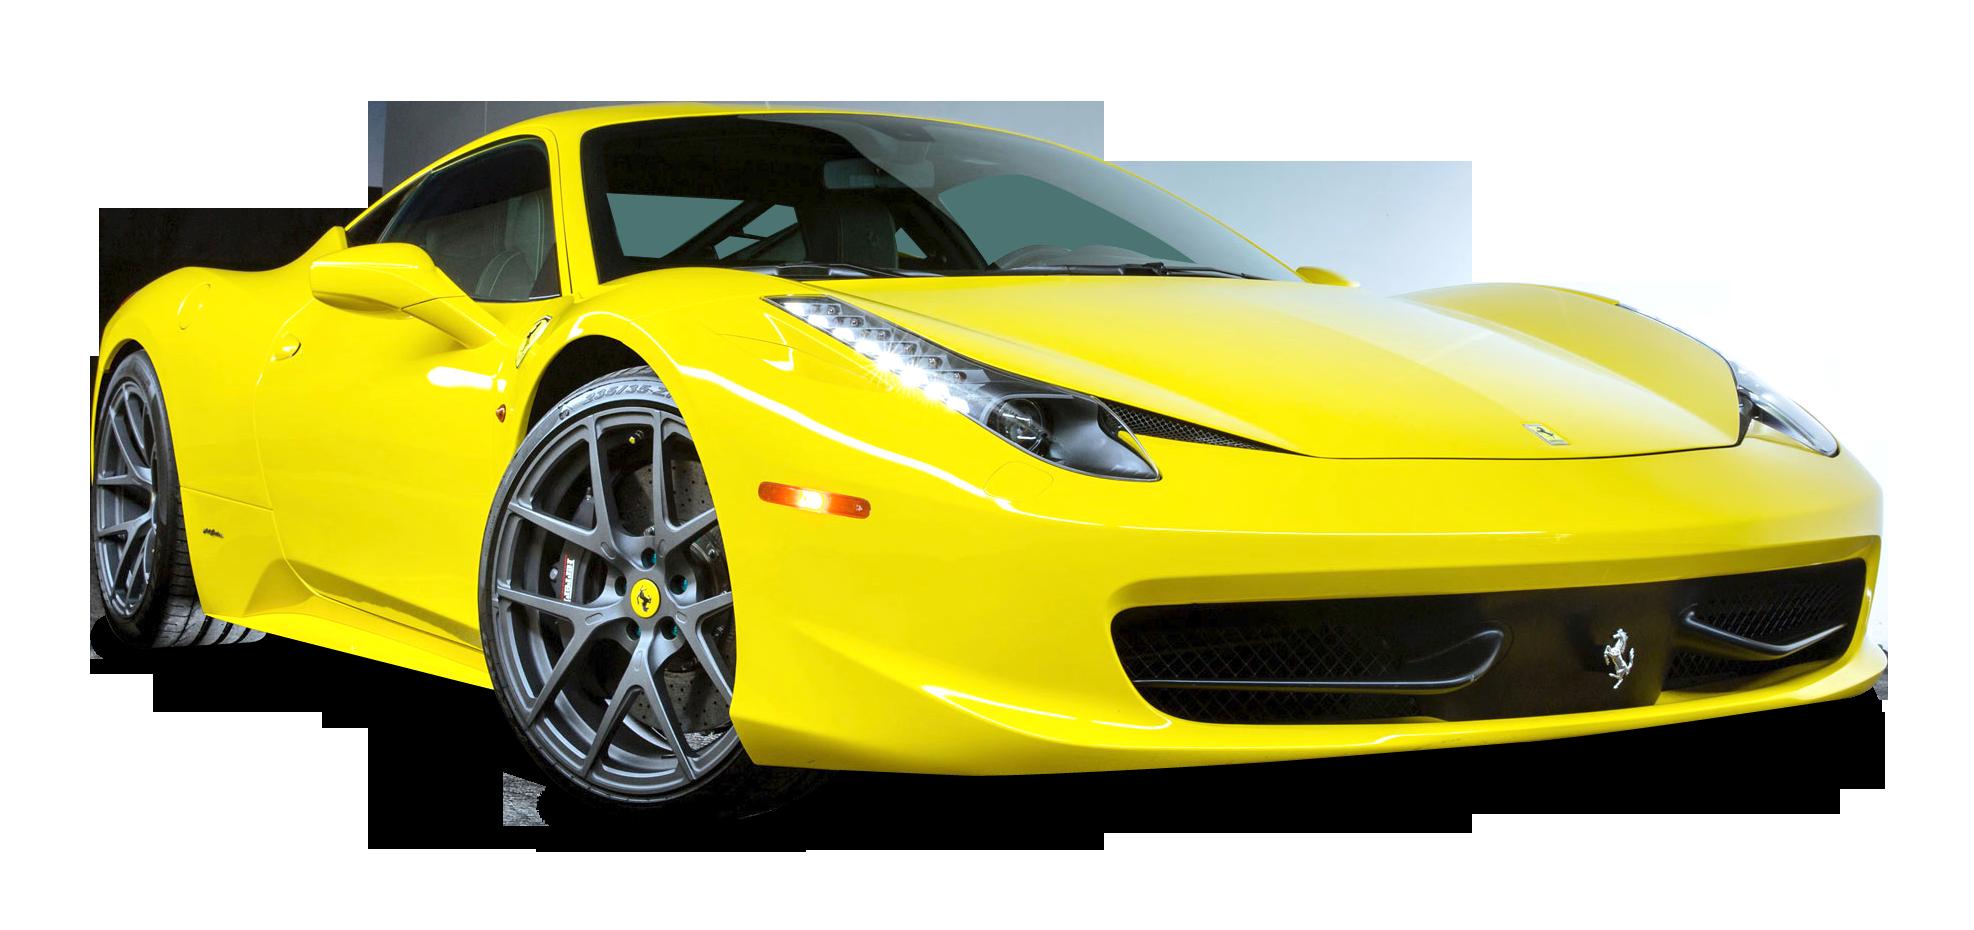 Ferrari 458 Italia Car PNG Image